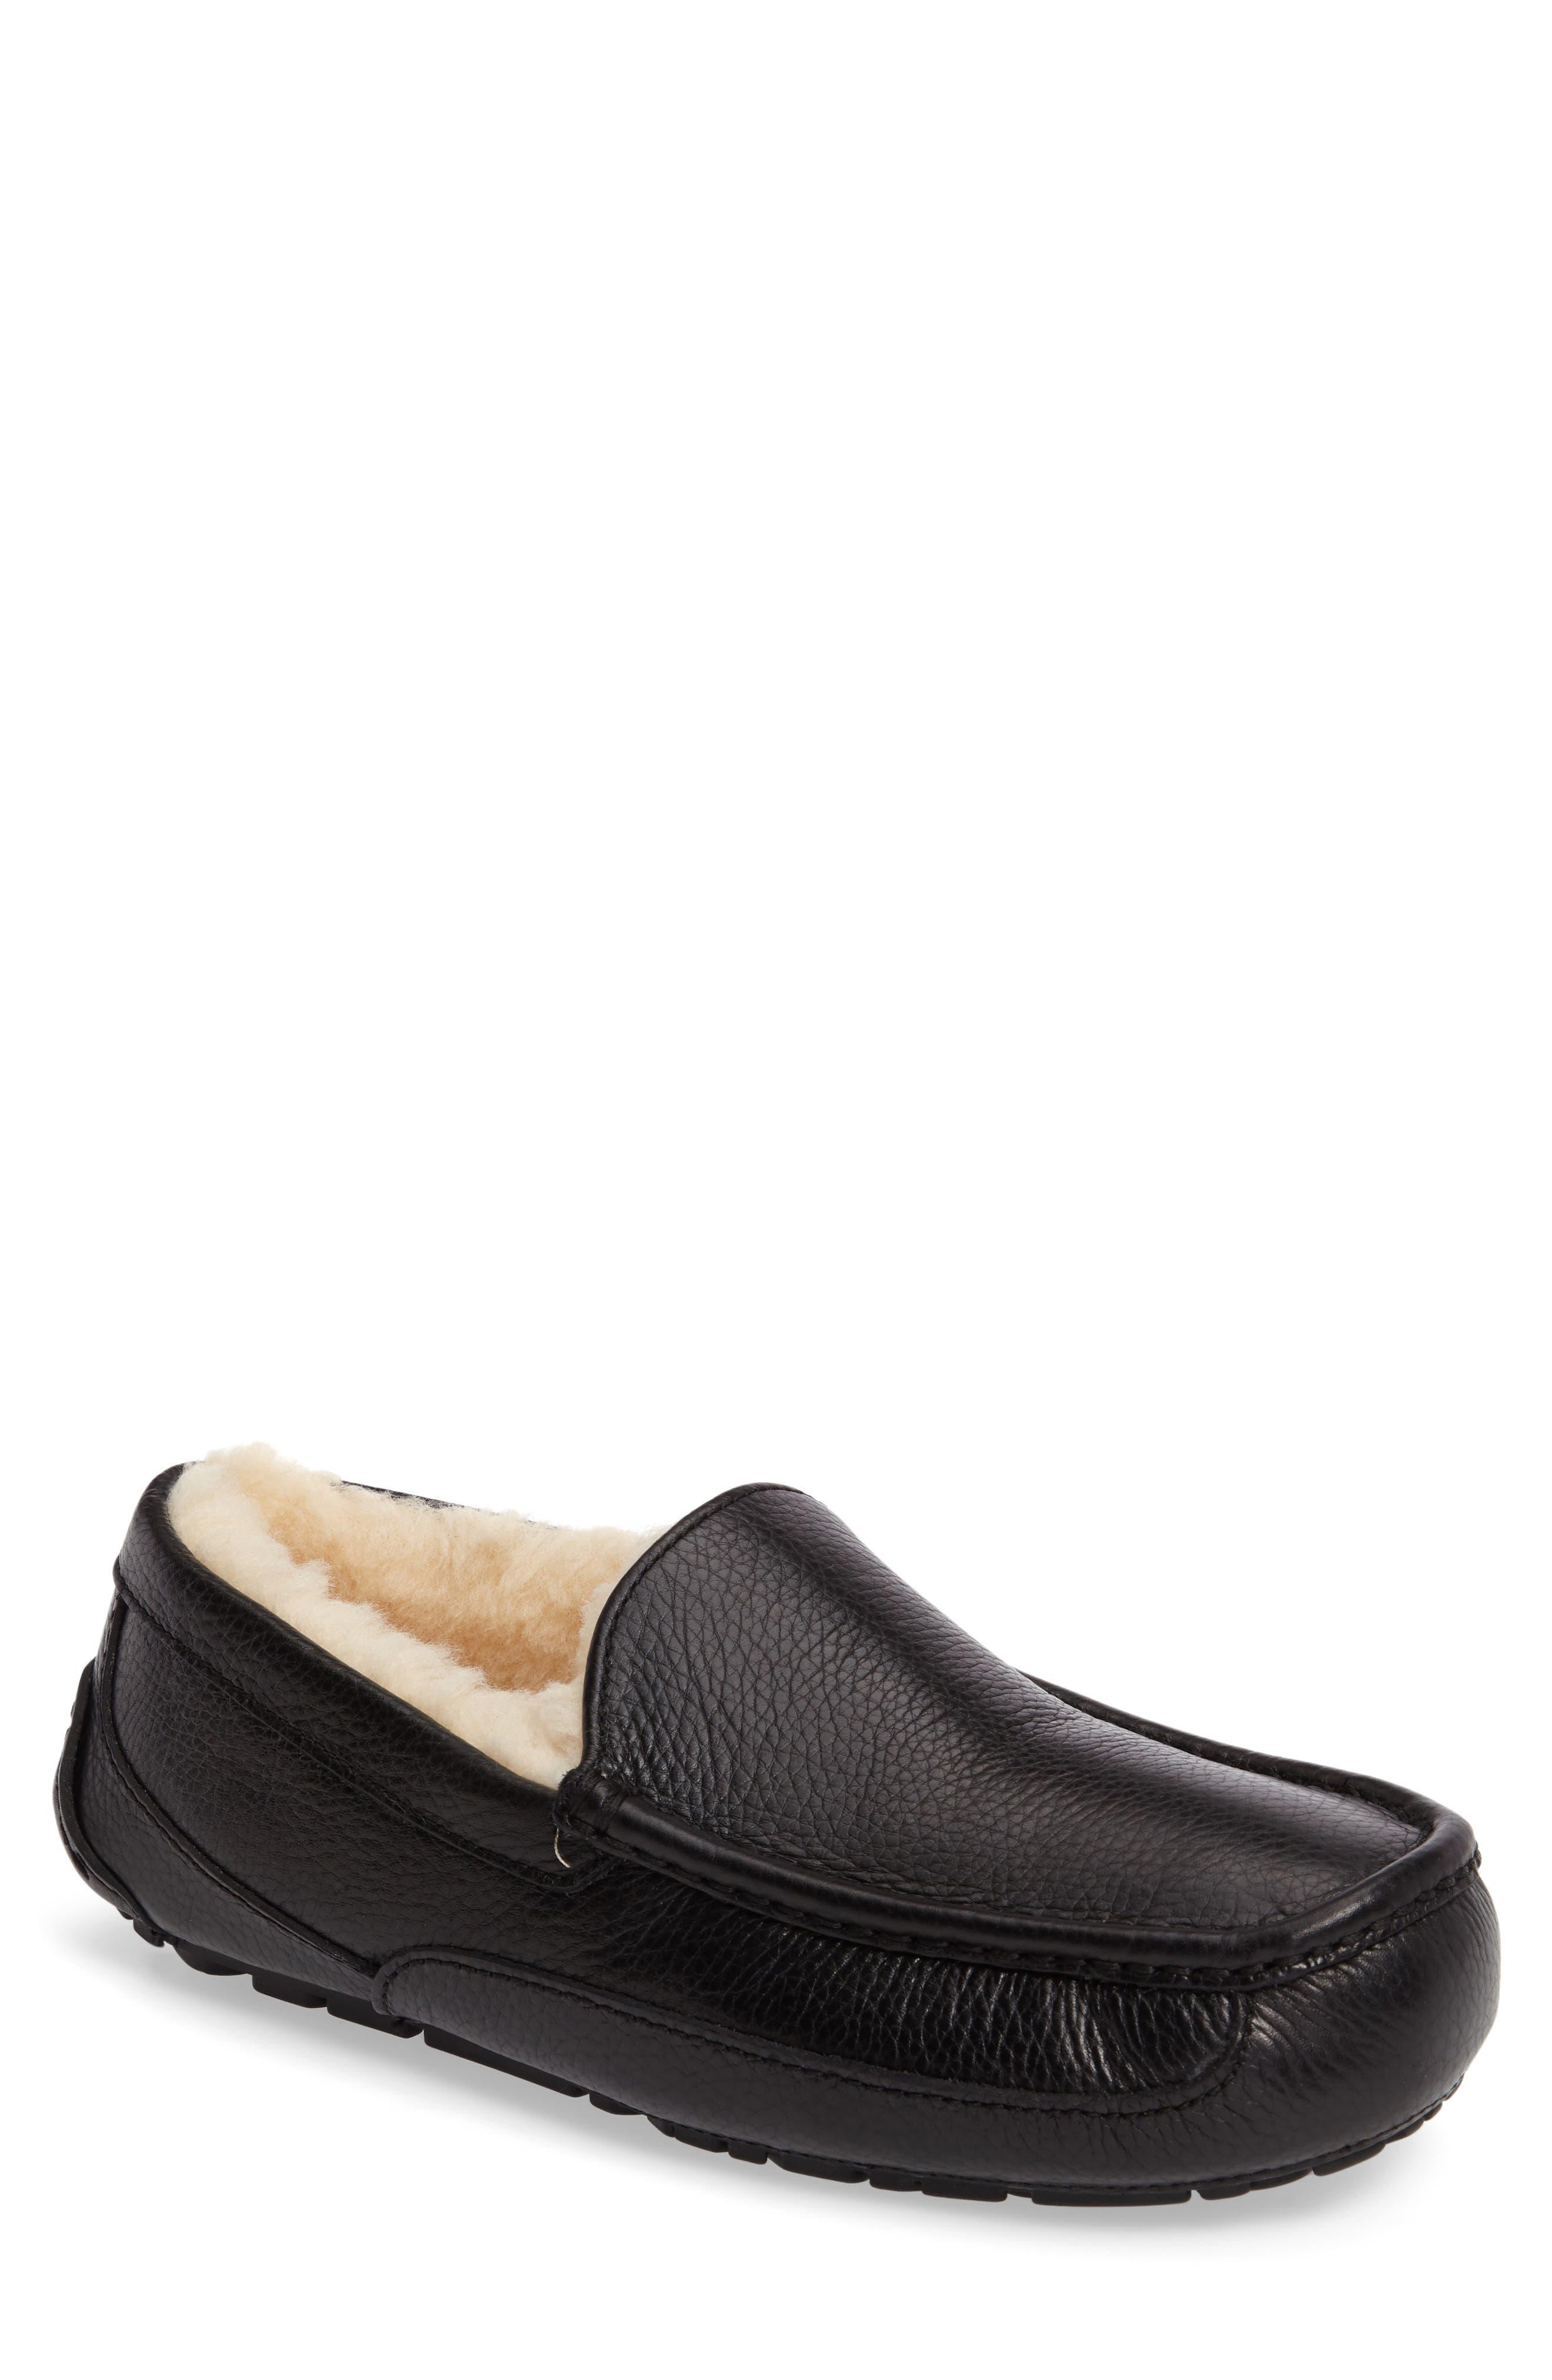 Ugg Ascot Leather Slipper, 8- Black